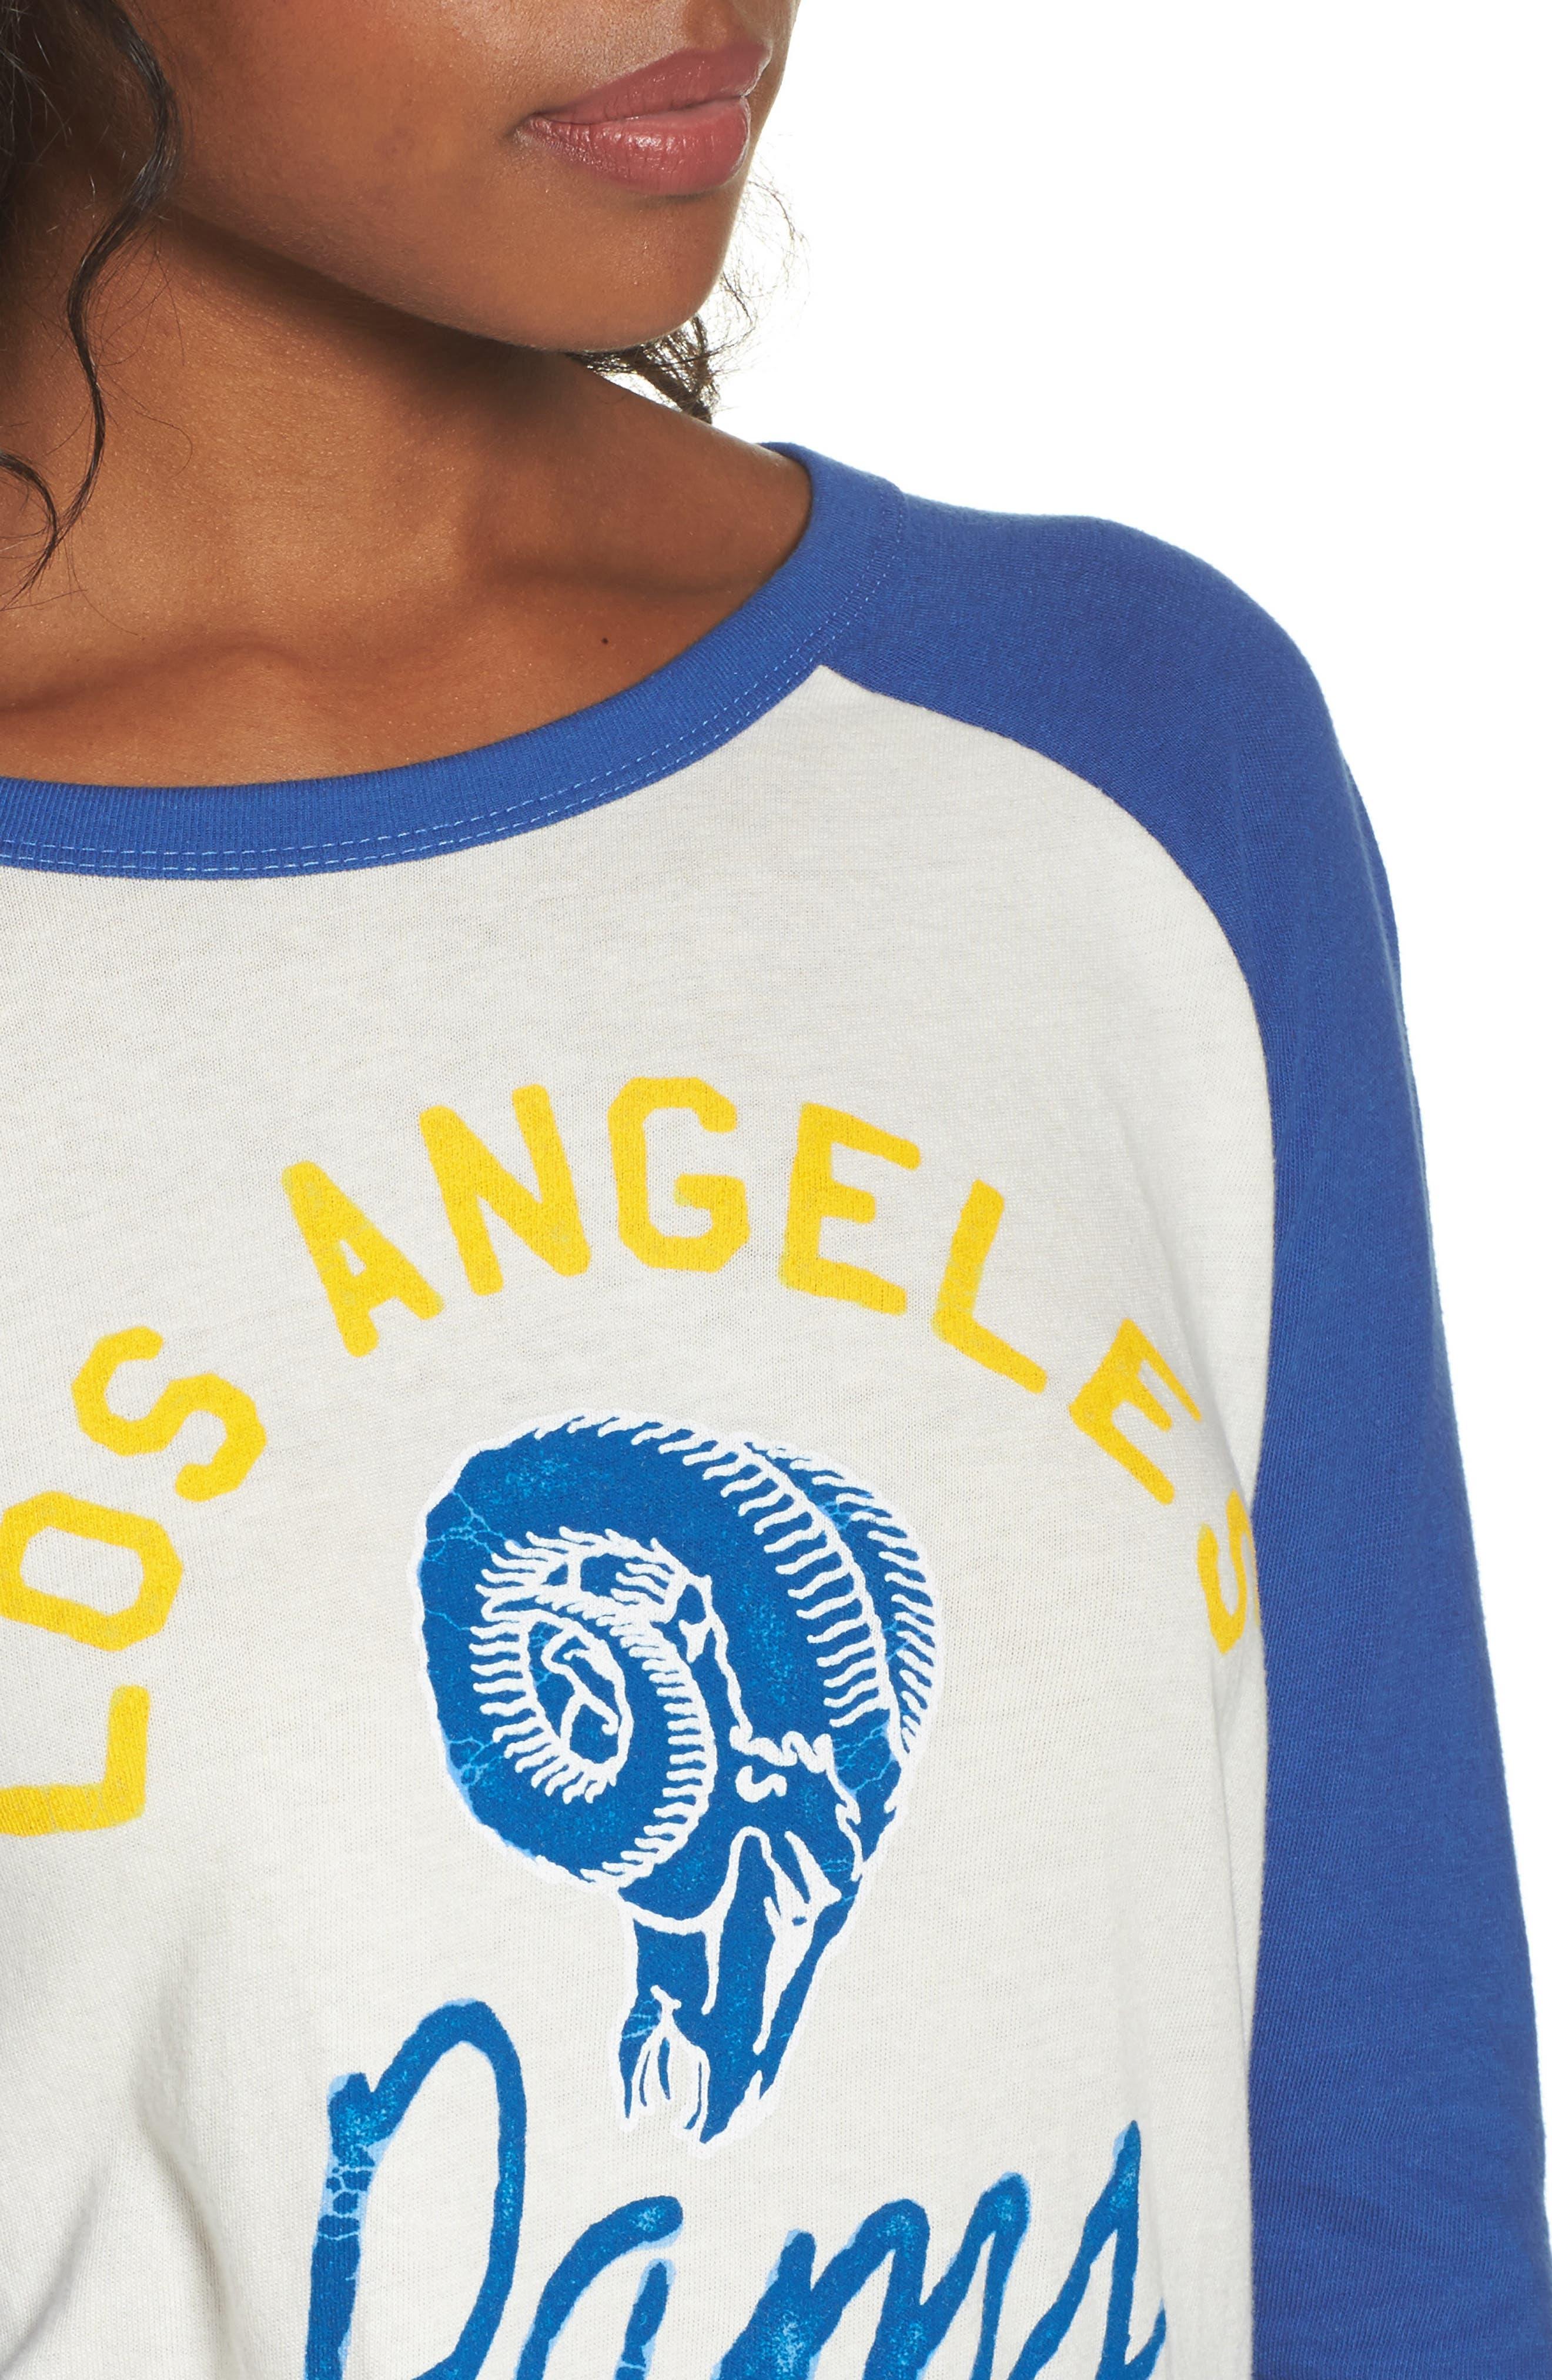 NFL Los Angeles Rams Raglan Tee,                             Alternate thumbnail 4, color,                             189